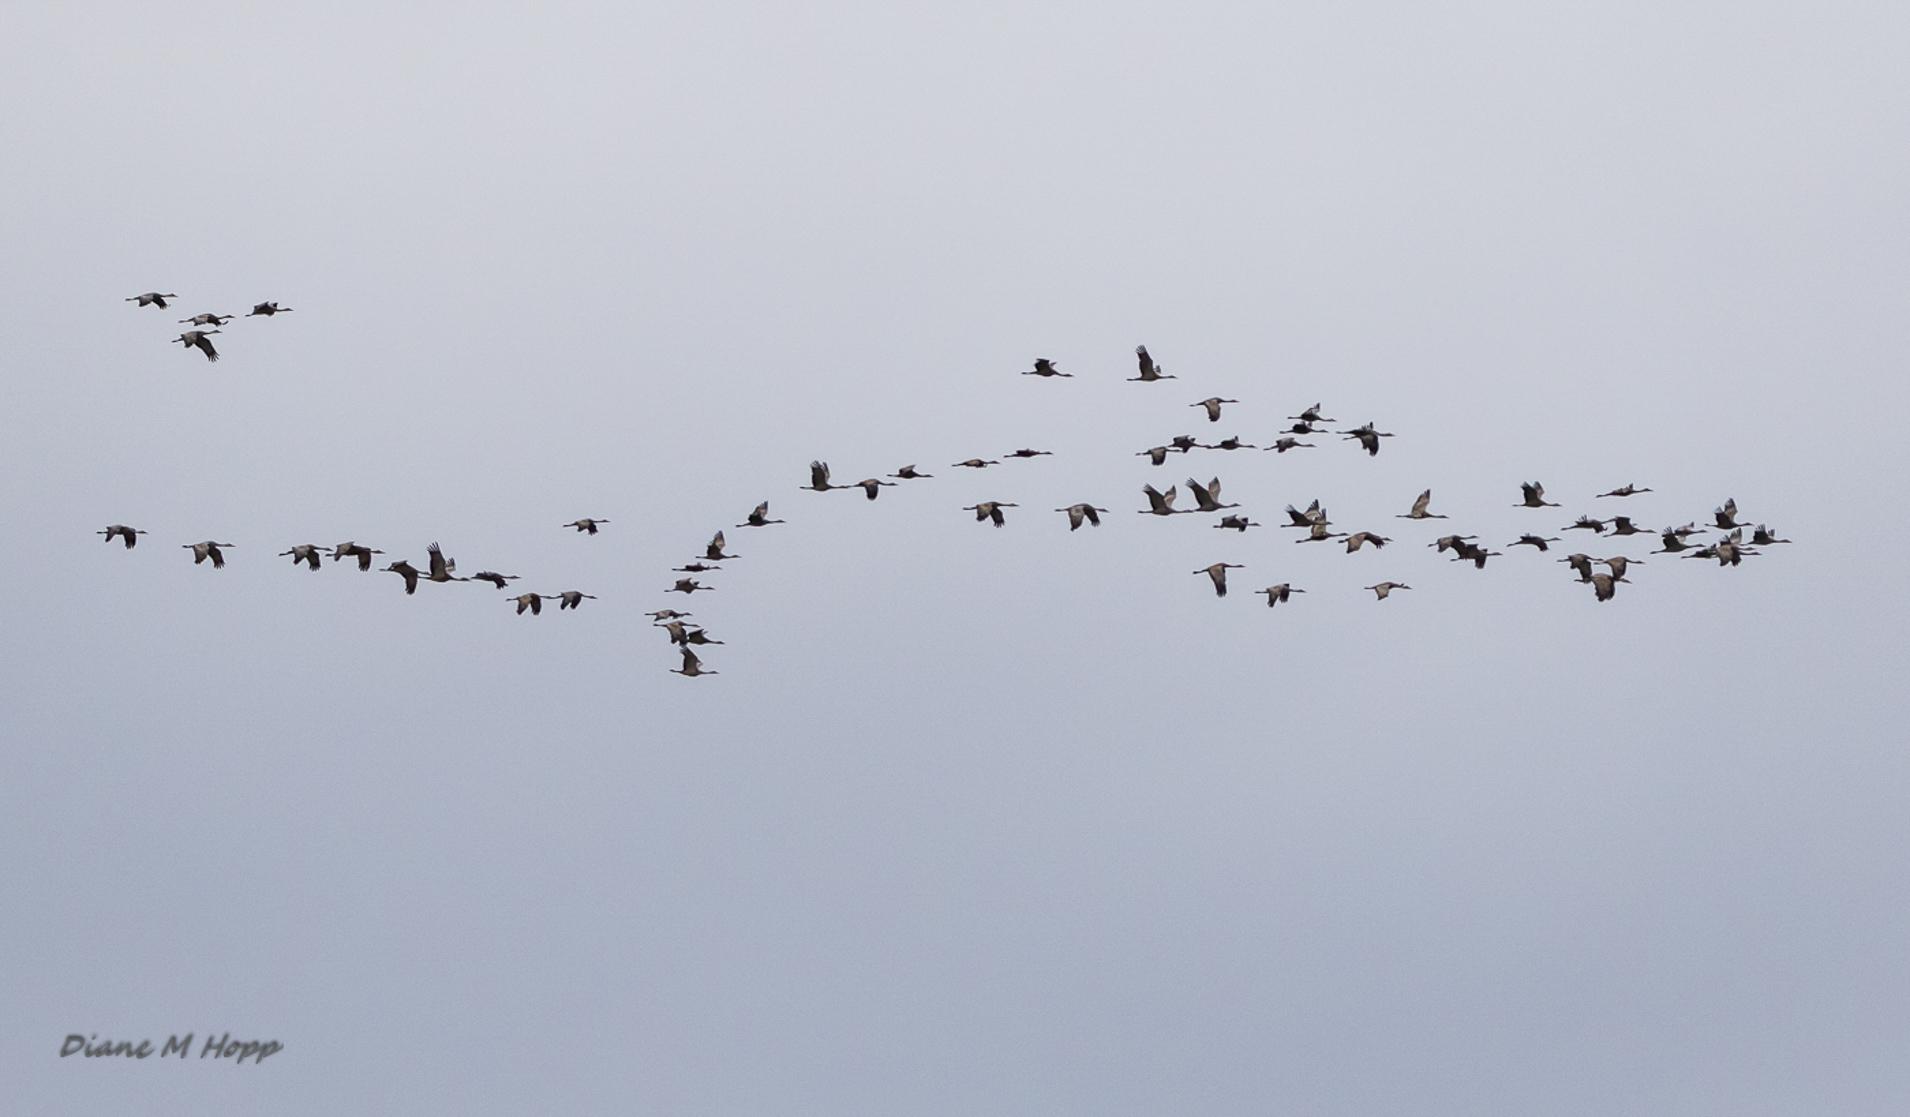 A Migration of Sandhill Cranes - DMHopp